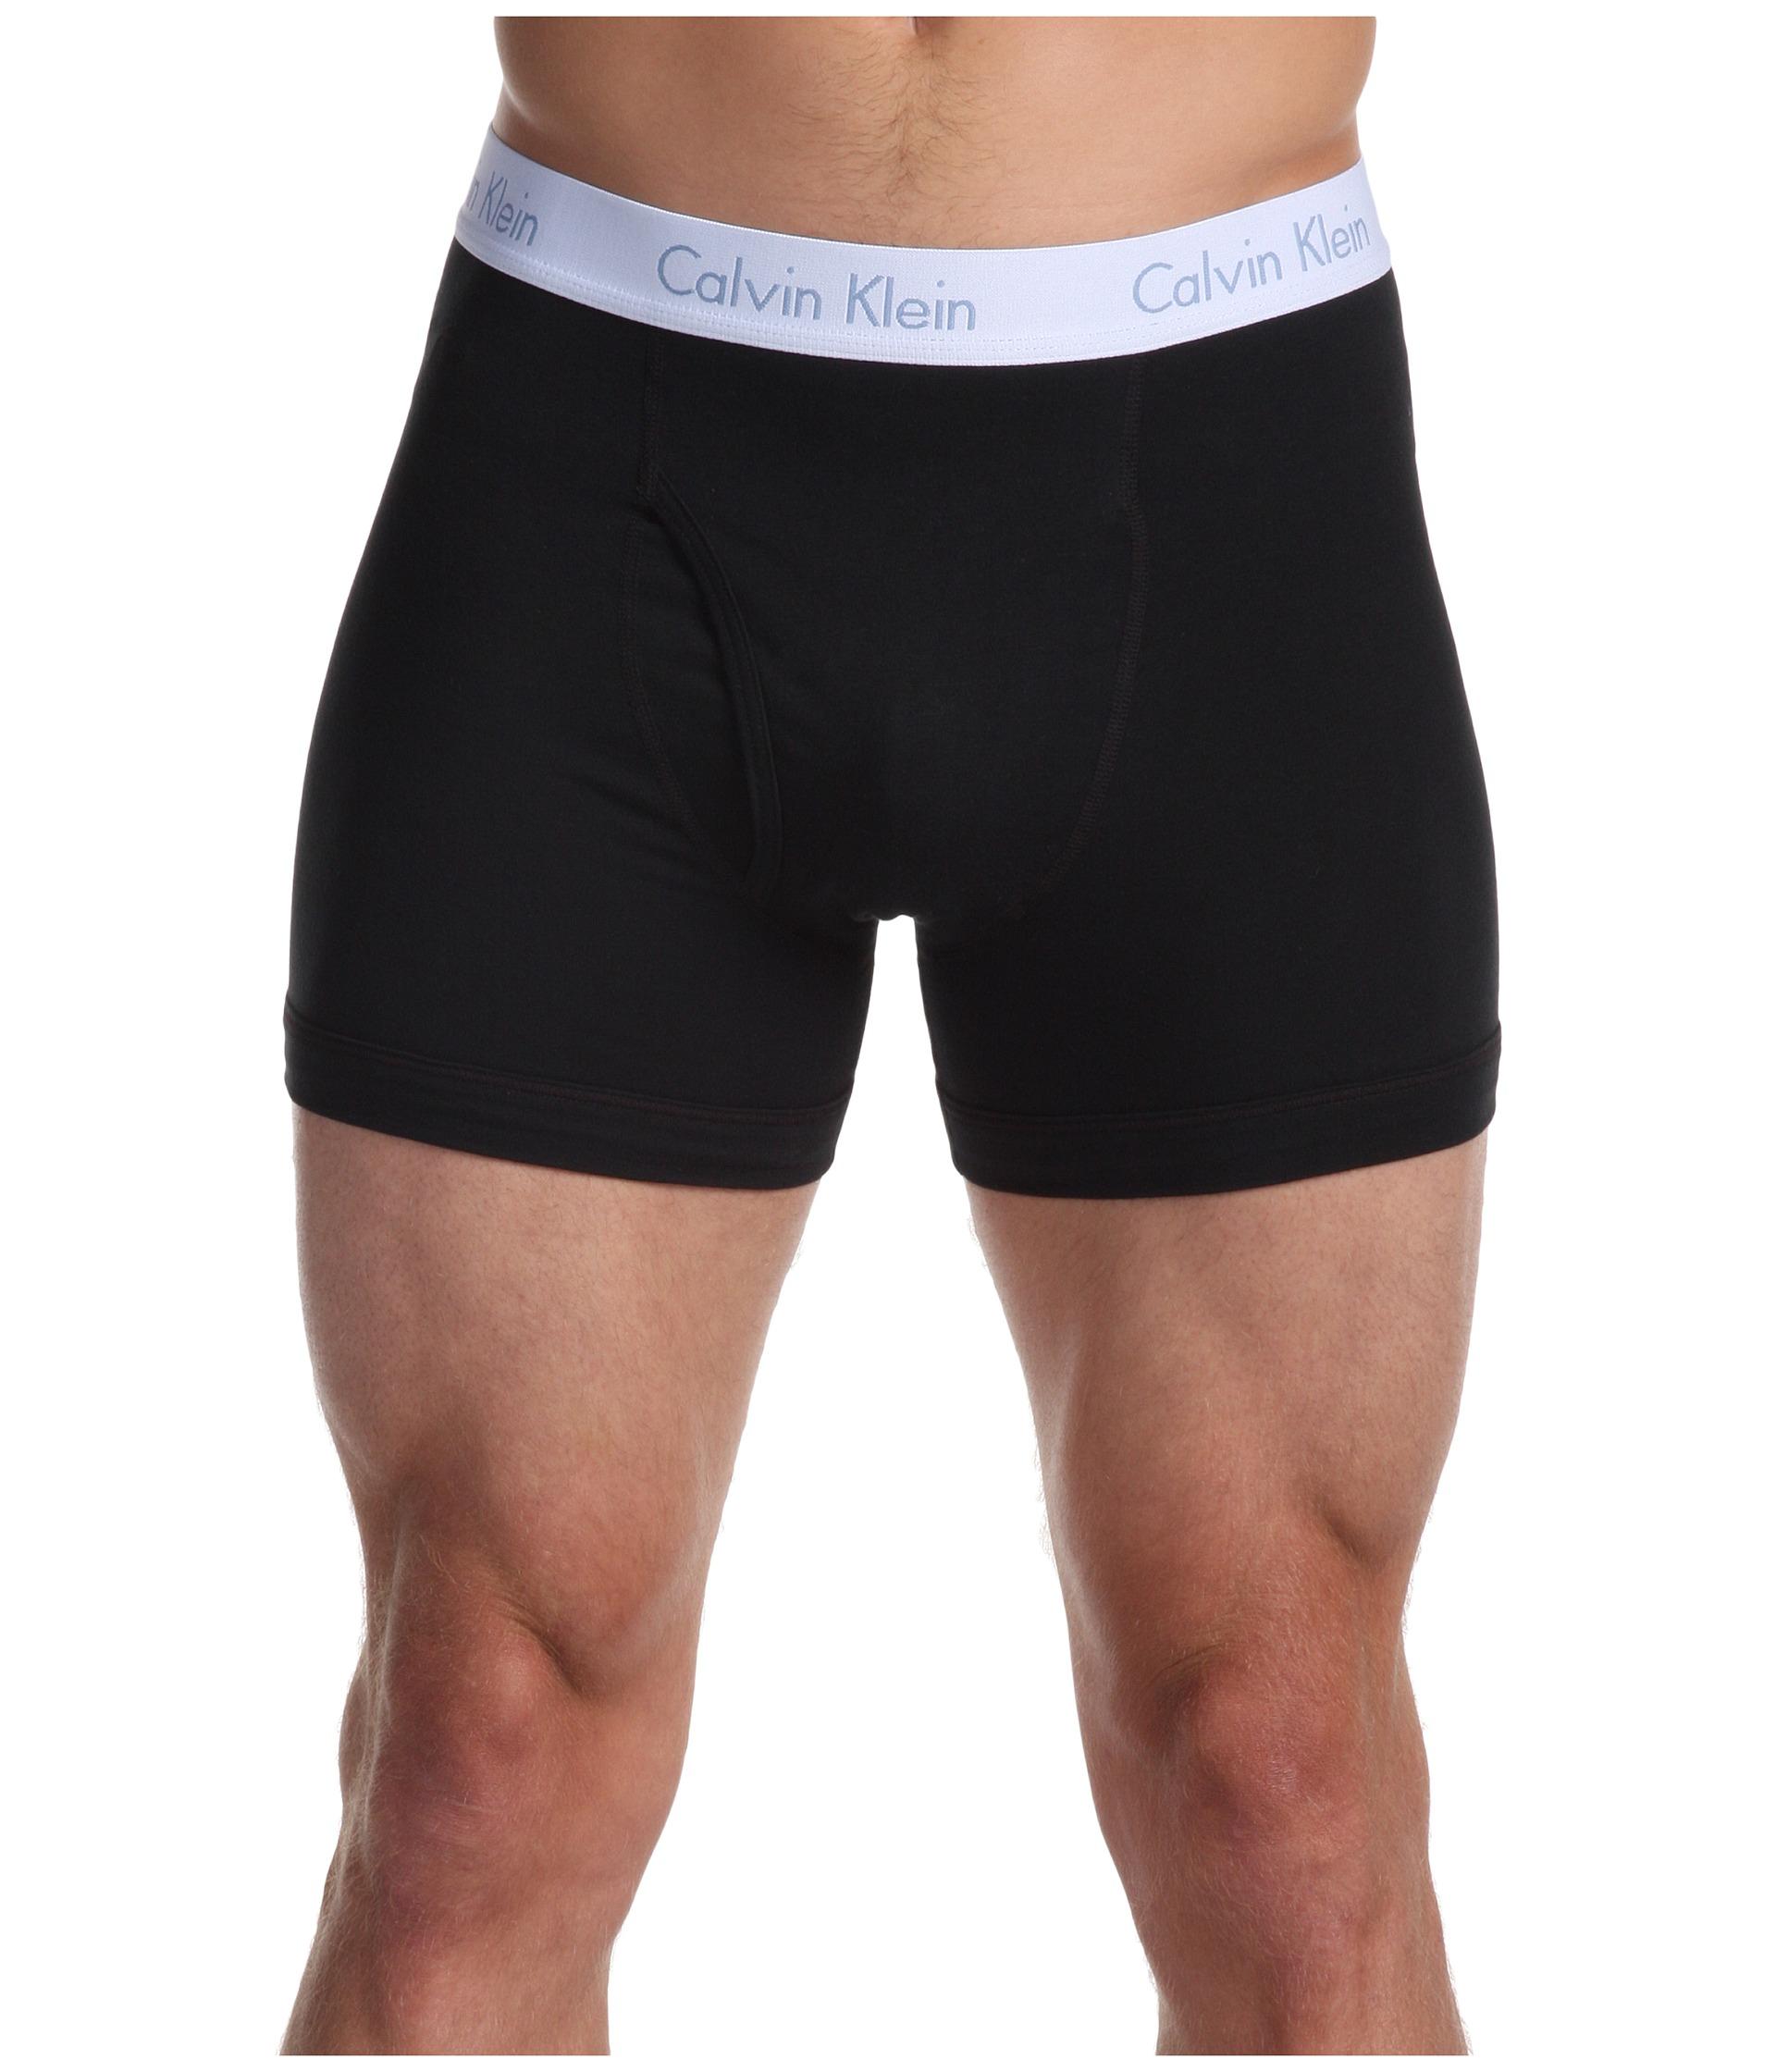 calvin klein flexible fit boxer brief u2158 in black for. Black Bedroom Furniture Sets. Home Design Ideas